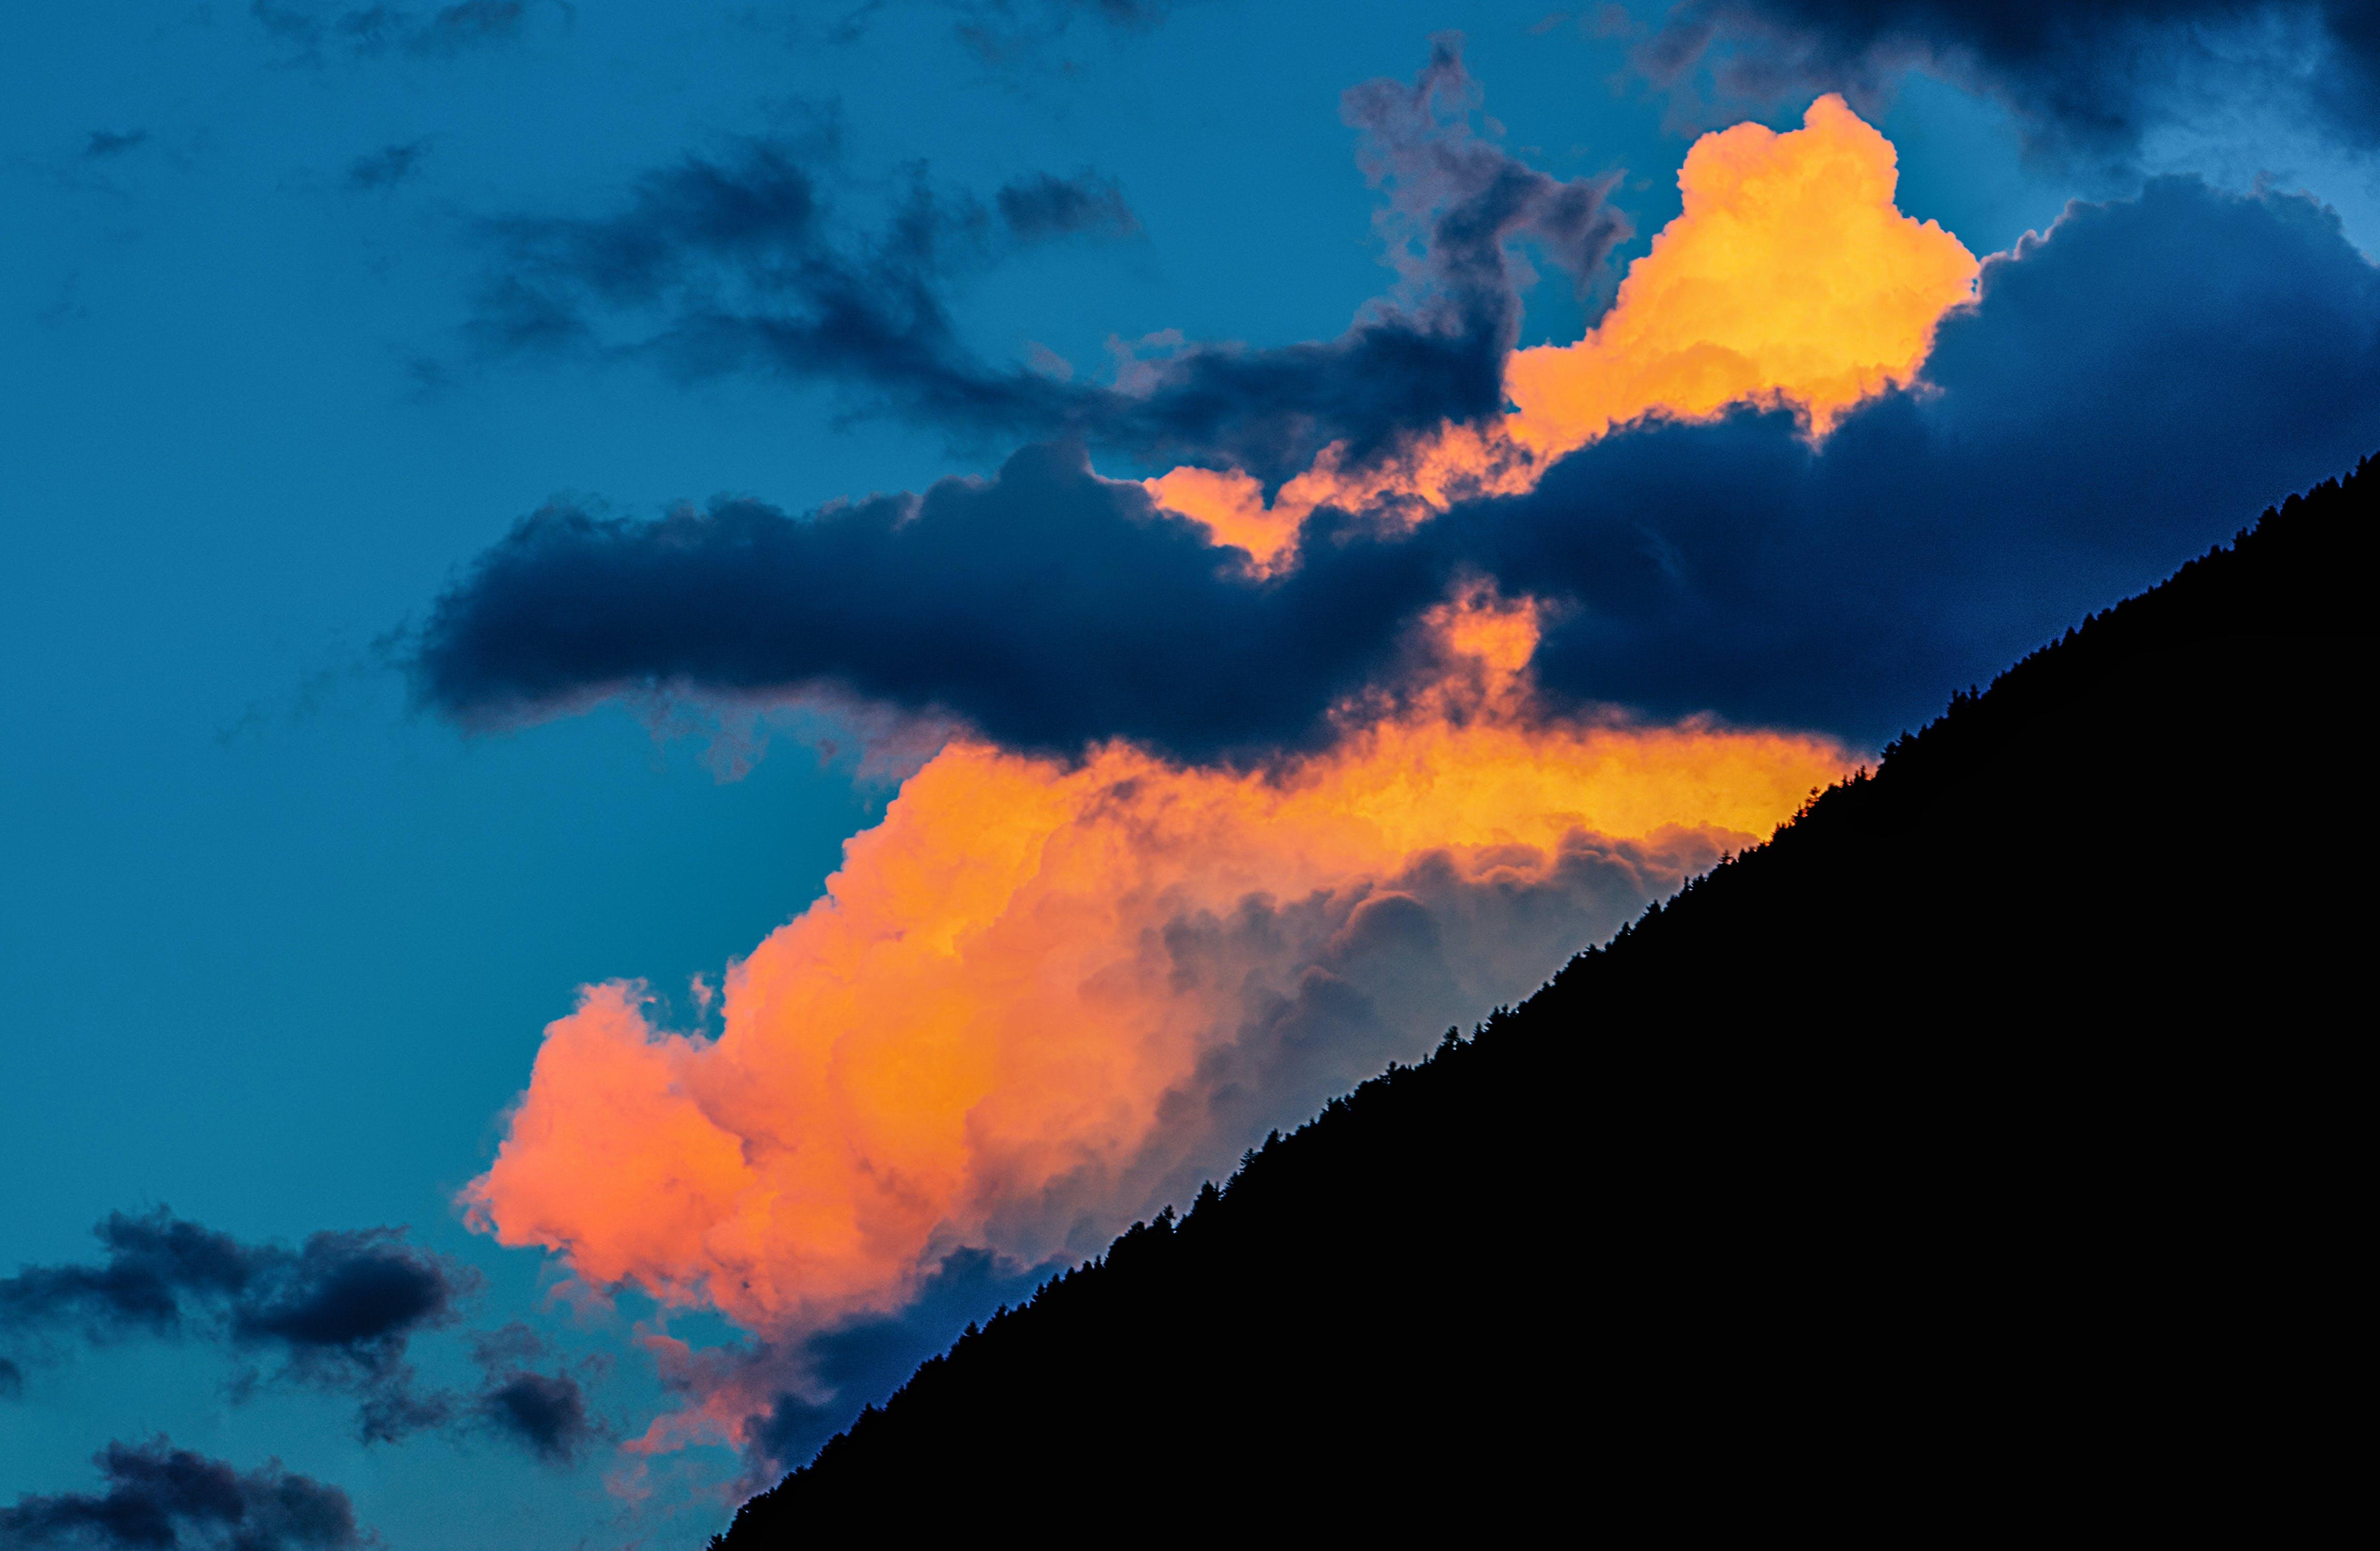 afterglow, backlit, blue sky